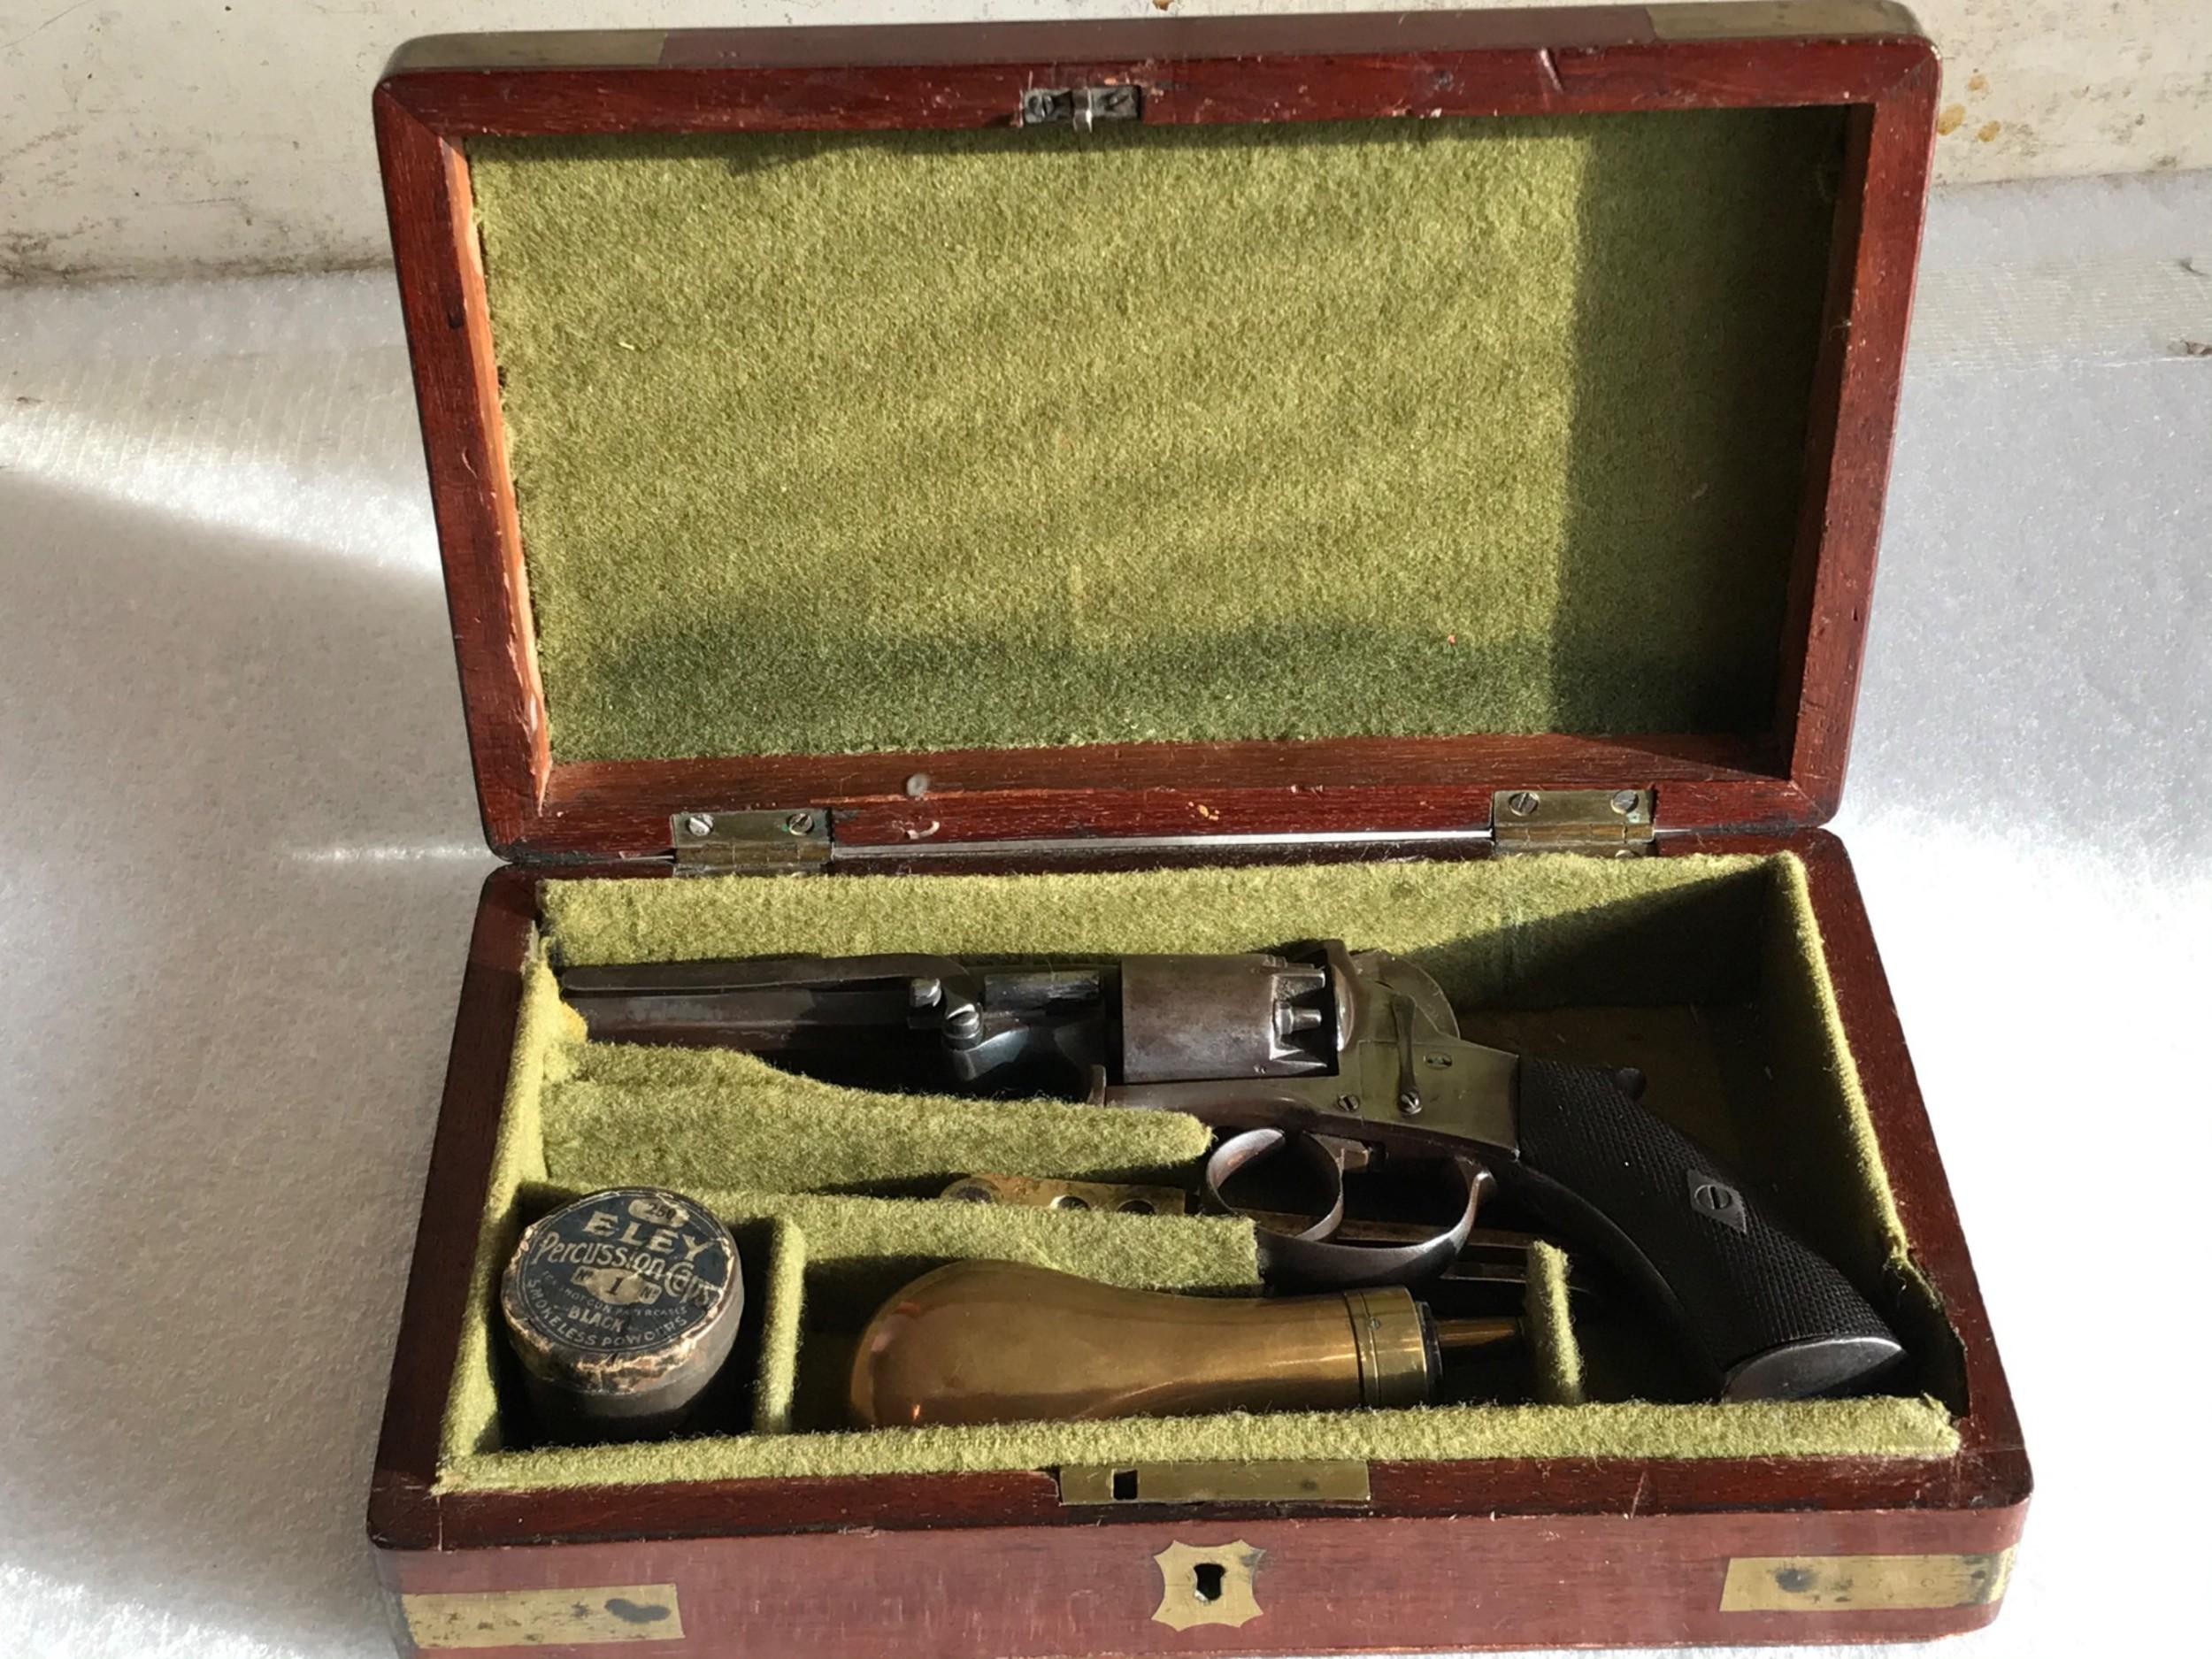 pistol percussion mid 19th century comes boxed